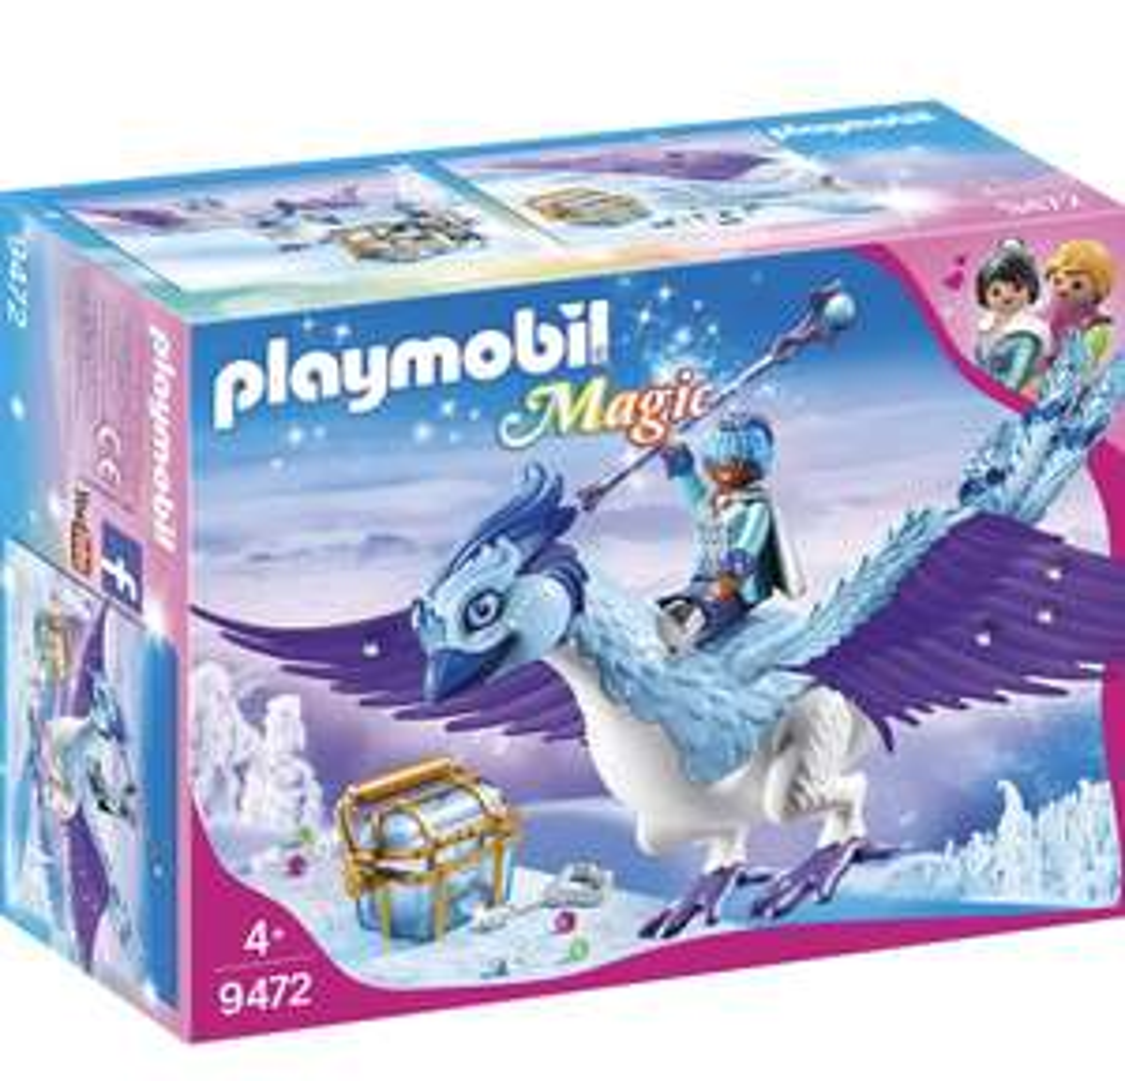 (Amazon Prime) PLAYMOBIL 9472 Spielzeug-Prachtvoller Phönix